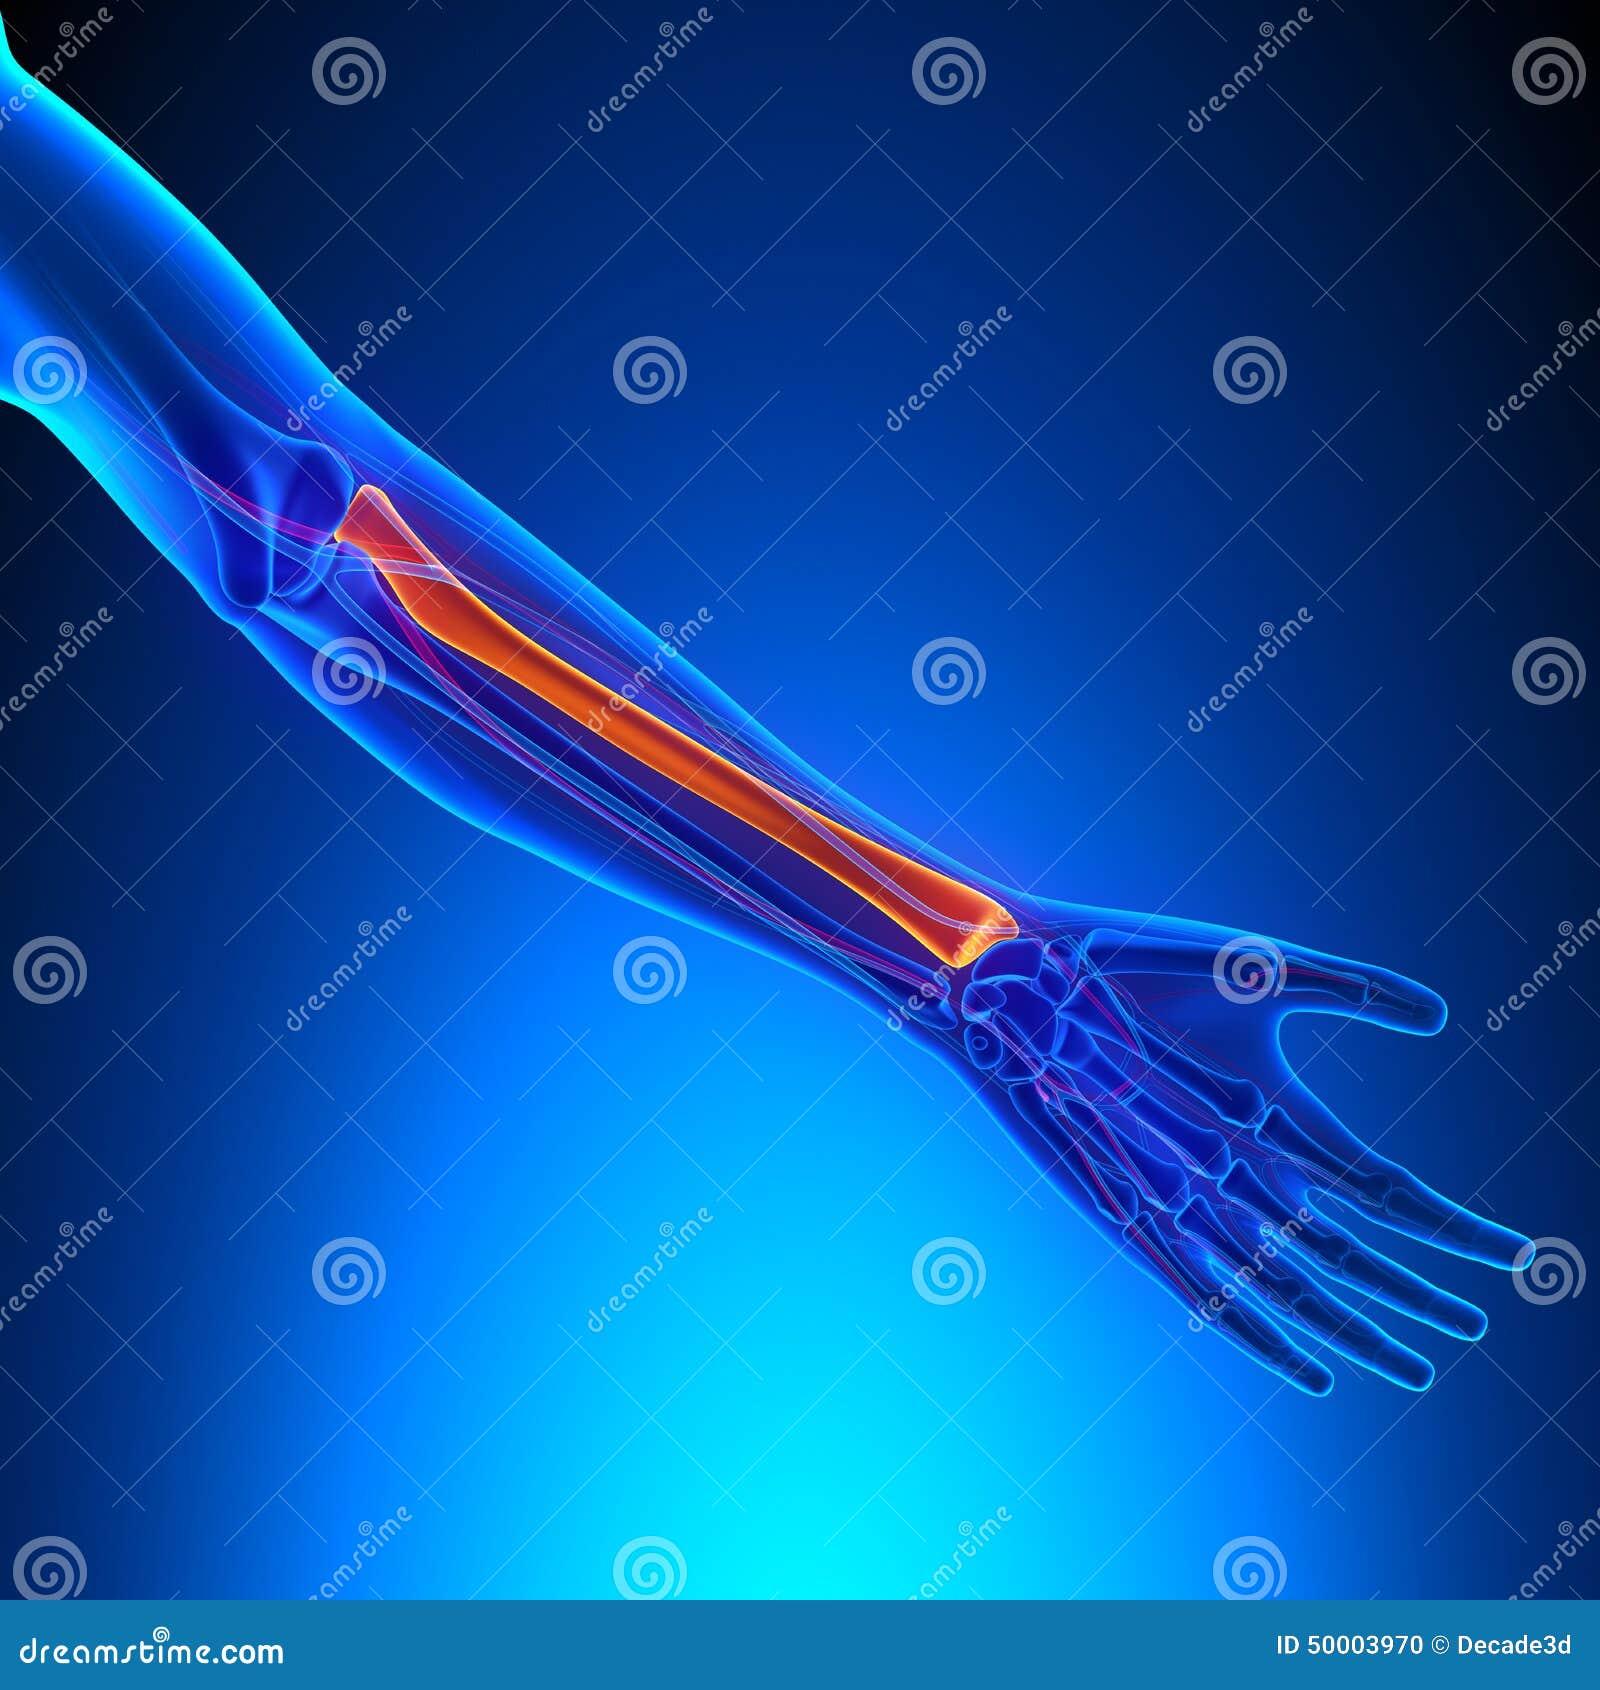 Radius Anatomy Bone With Ciculatory System Stock Photo Image Of